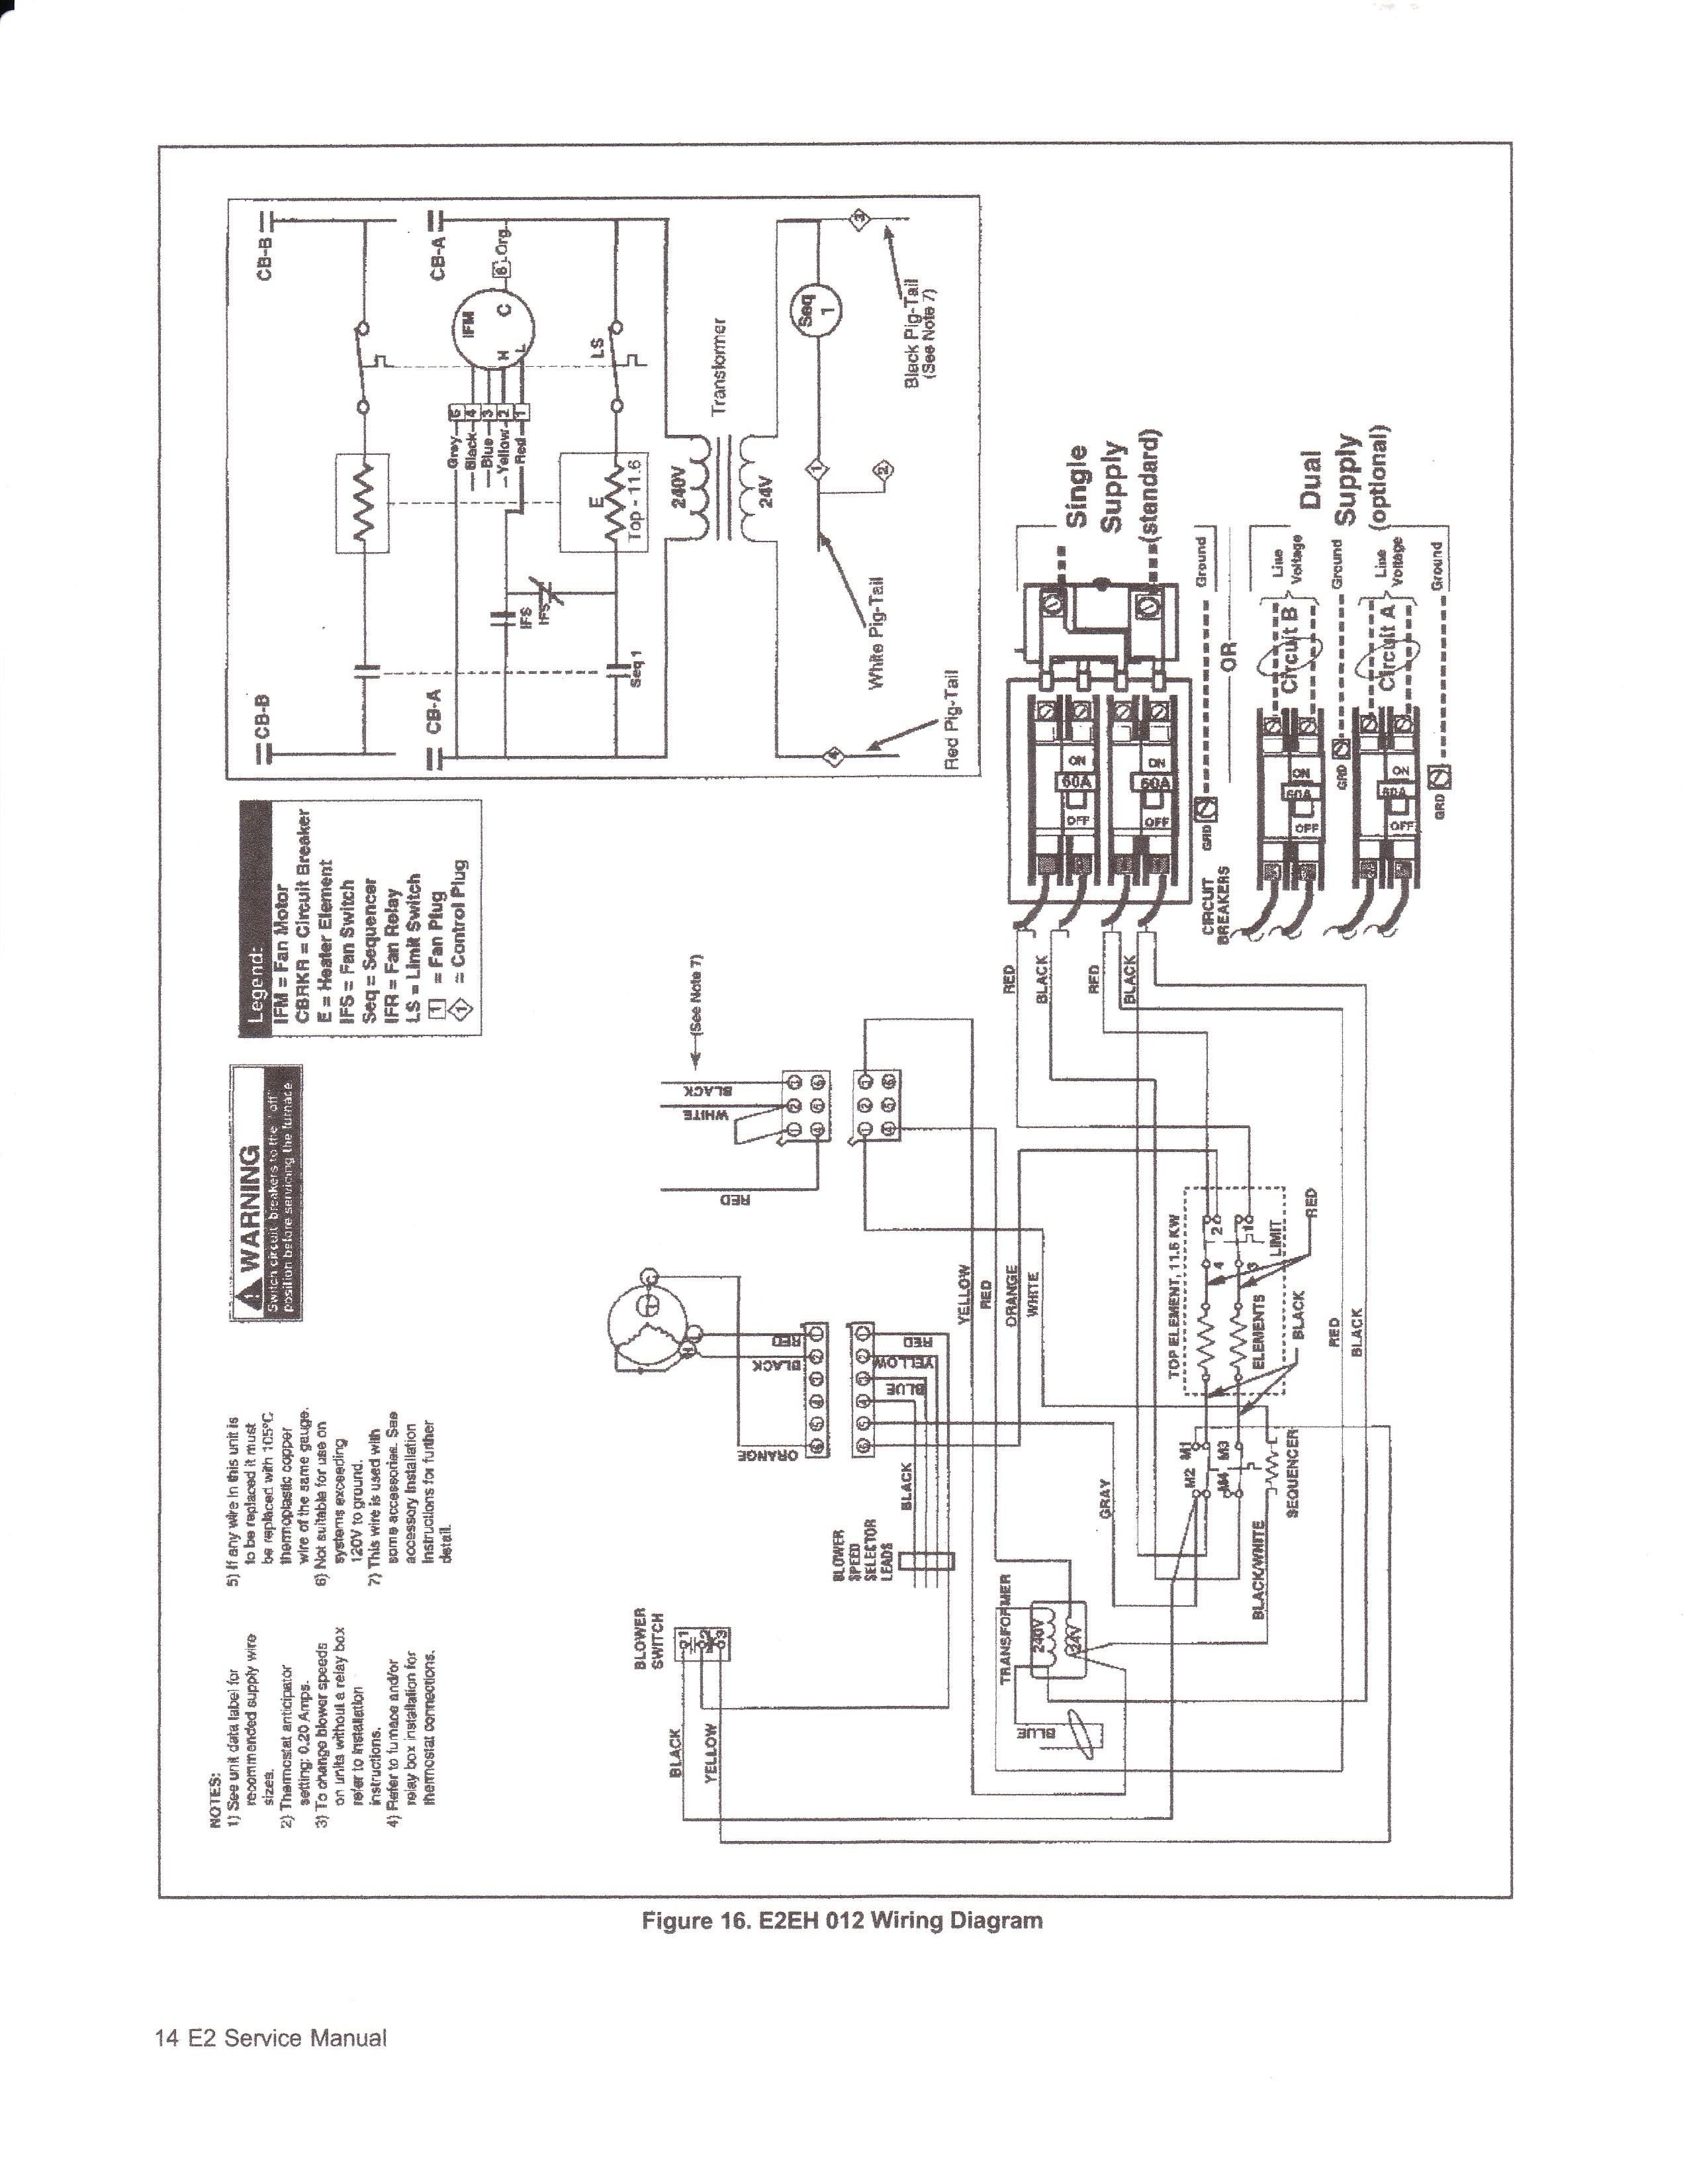 intertherm electric wiring diagram 8 euoonaed urbanecologist info \u2022